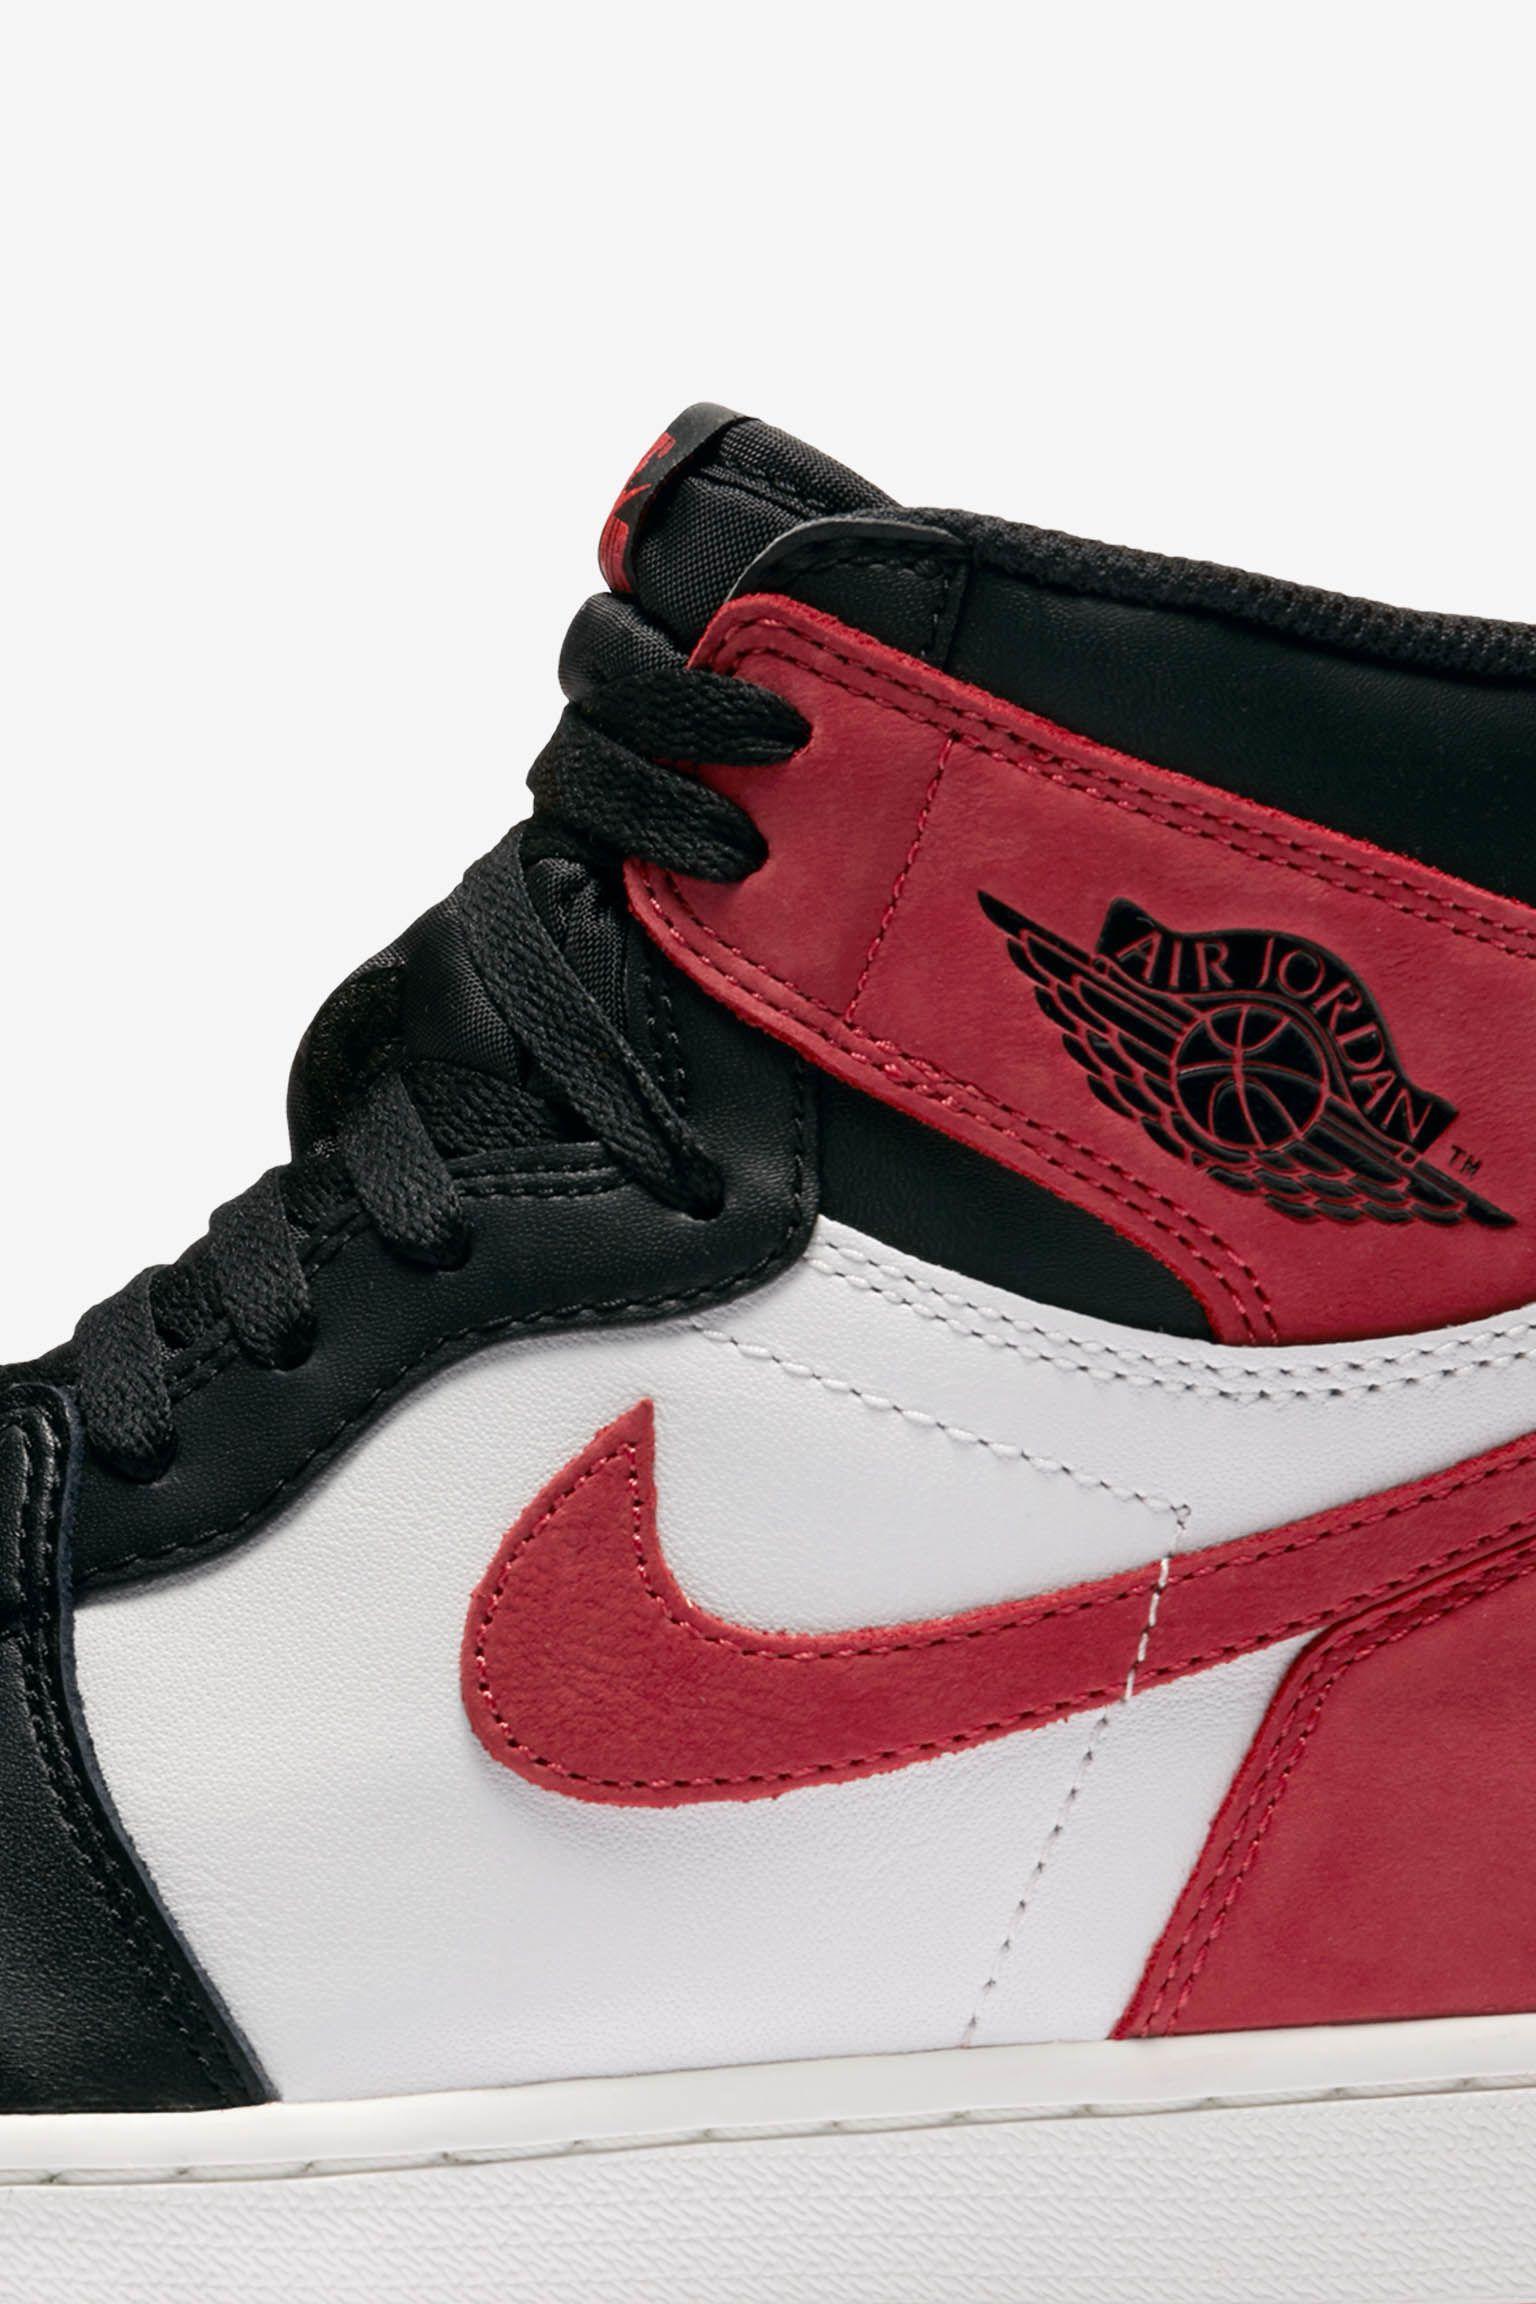 1 Summit amp; Lanzamiento De Las Fecha Nike White Jordan Air Zv0cYqw